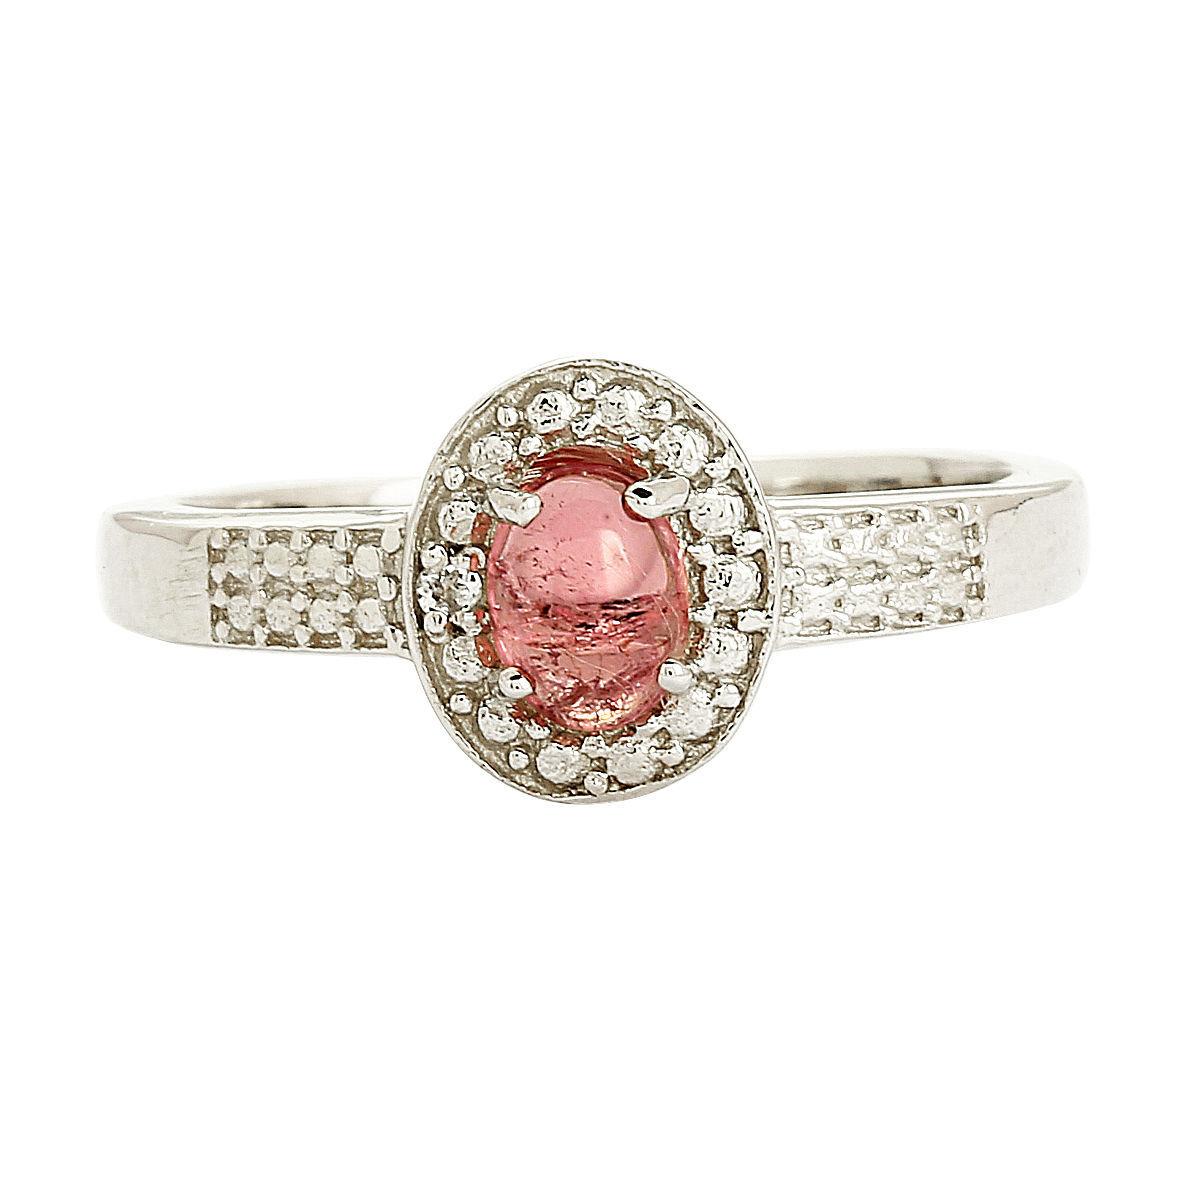 925 Sterling Silver Pink Tourmaline White Topaz Ring Jewelry Sz 6.5 SHRI0207